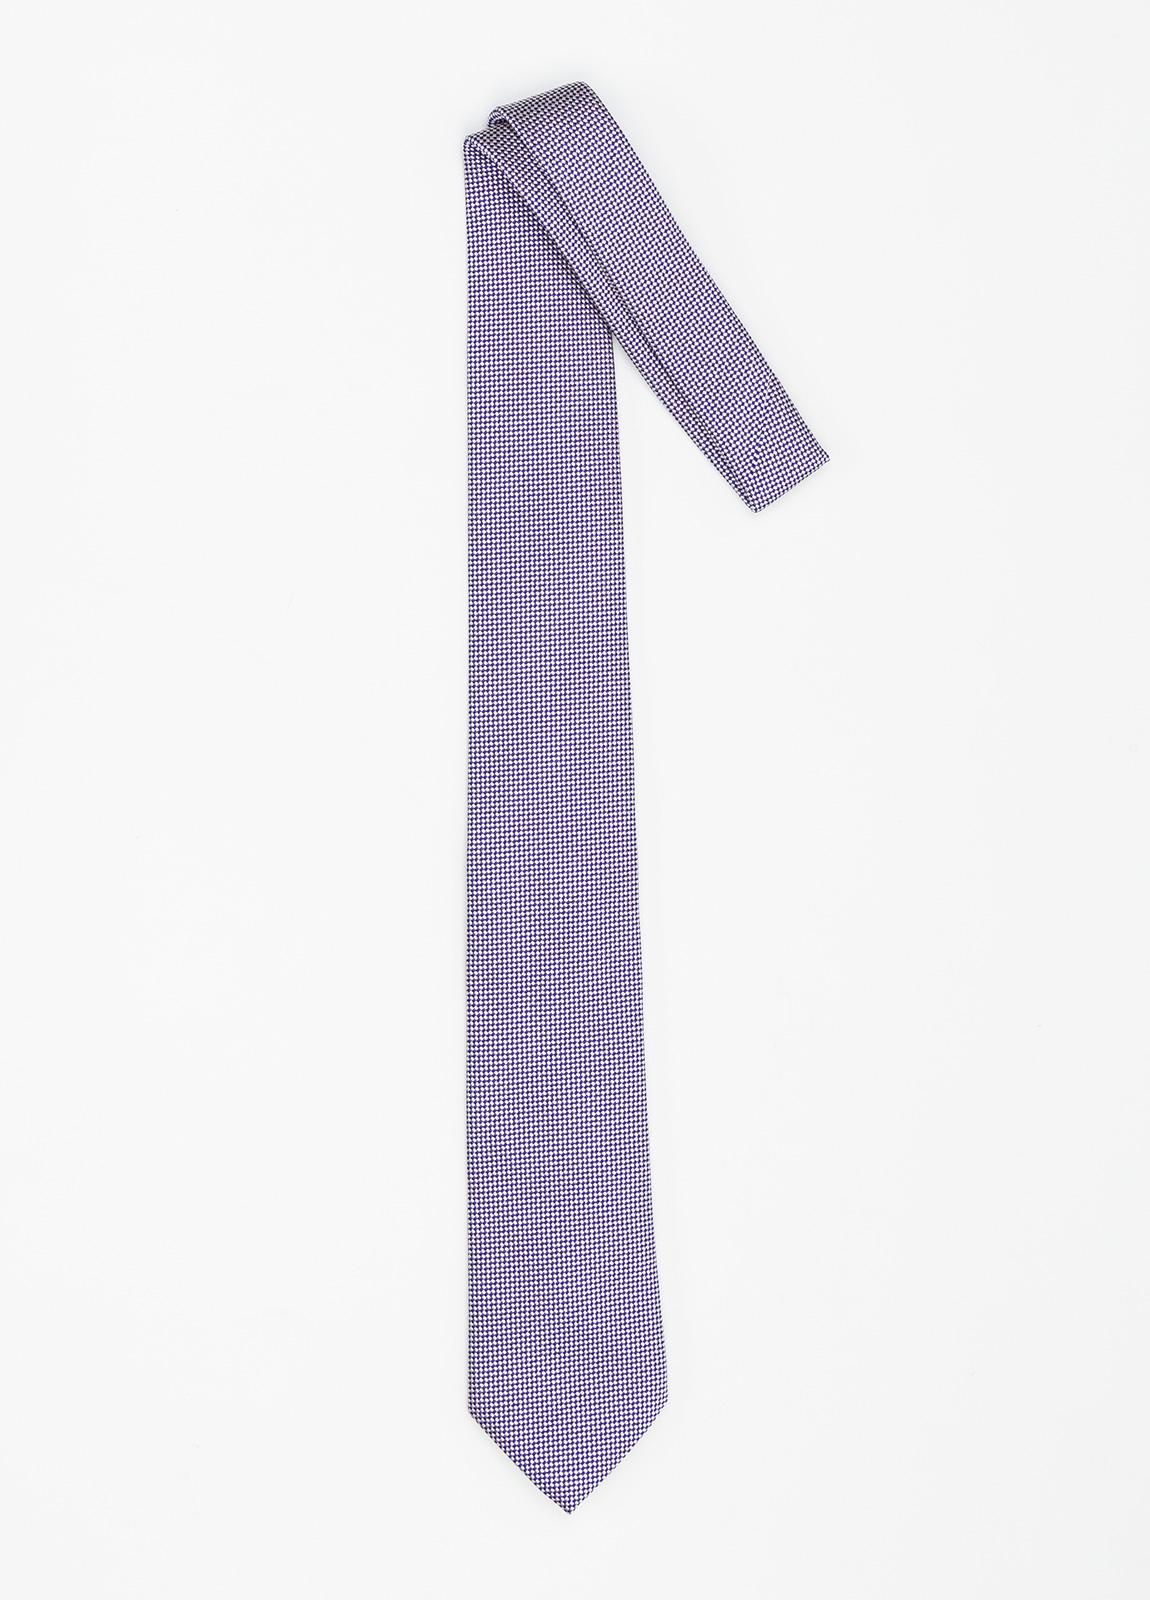 Corbata Formal Wear micro dibujo color azul. Pala 7,5 cm. Seda y Algodón. - Ítem1